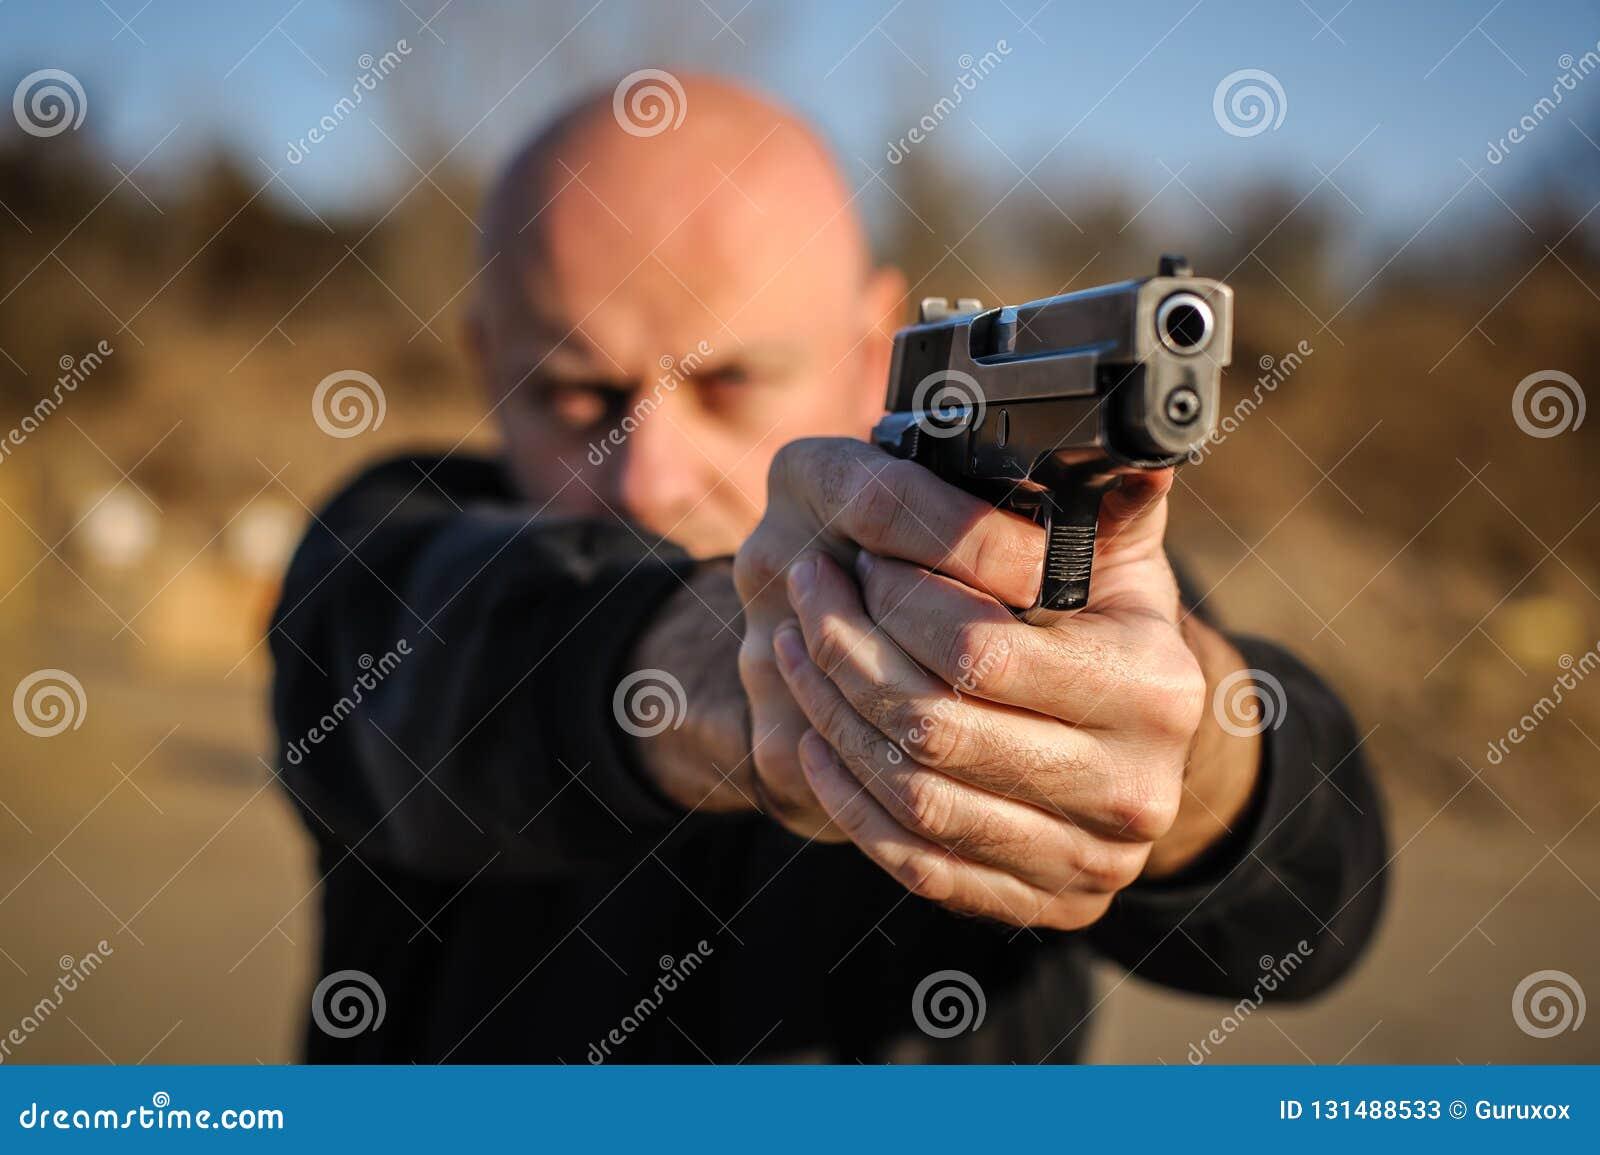 Agente de polícia e escolta que apontam a pistola para proteger do atacante